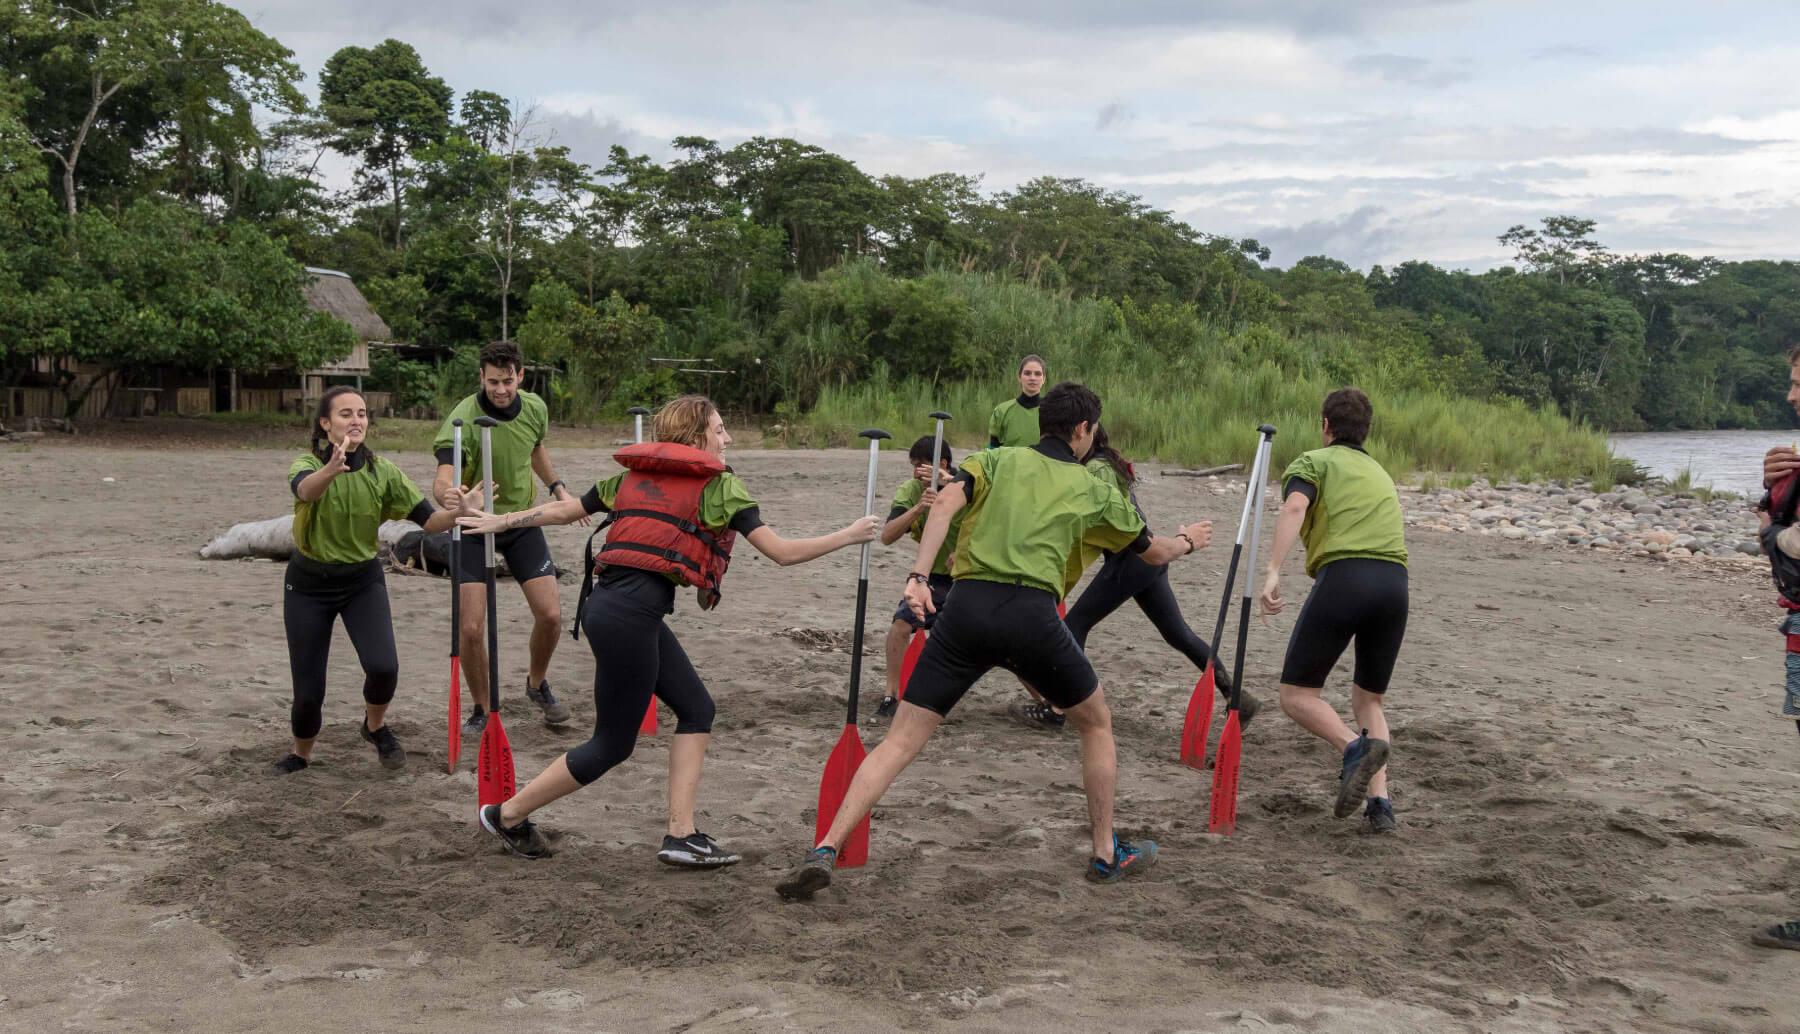 Beach games in Shandia before rafting trip